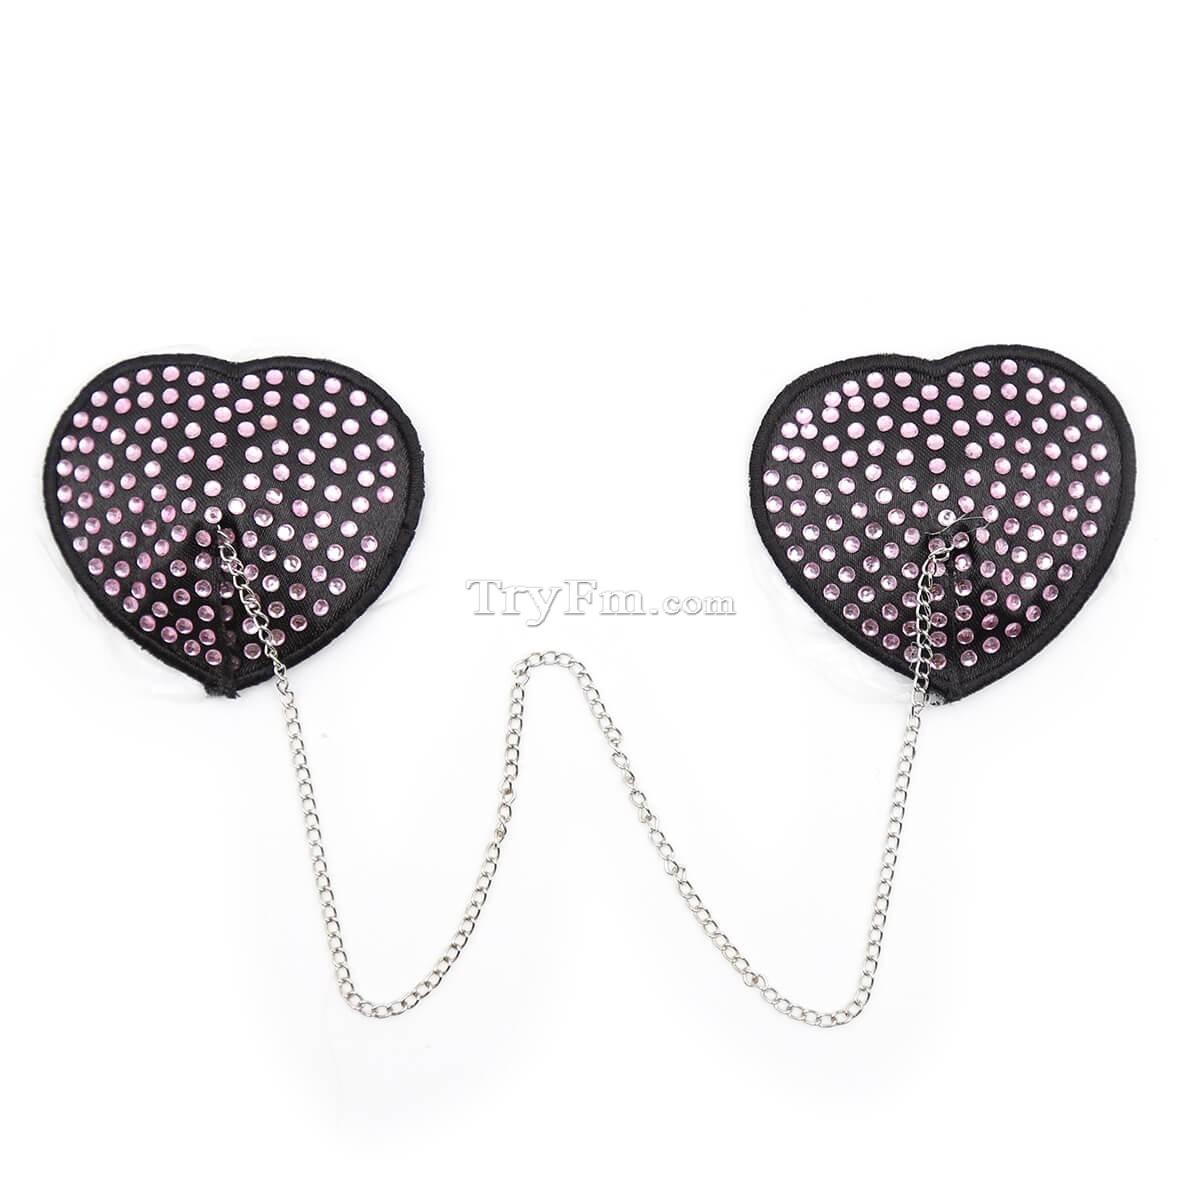 15-Glitter-heart-pasties14.jpg